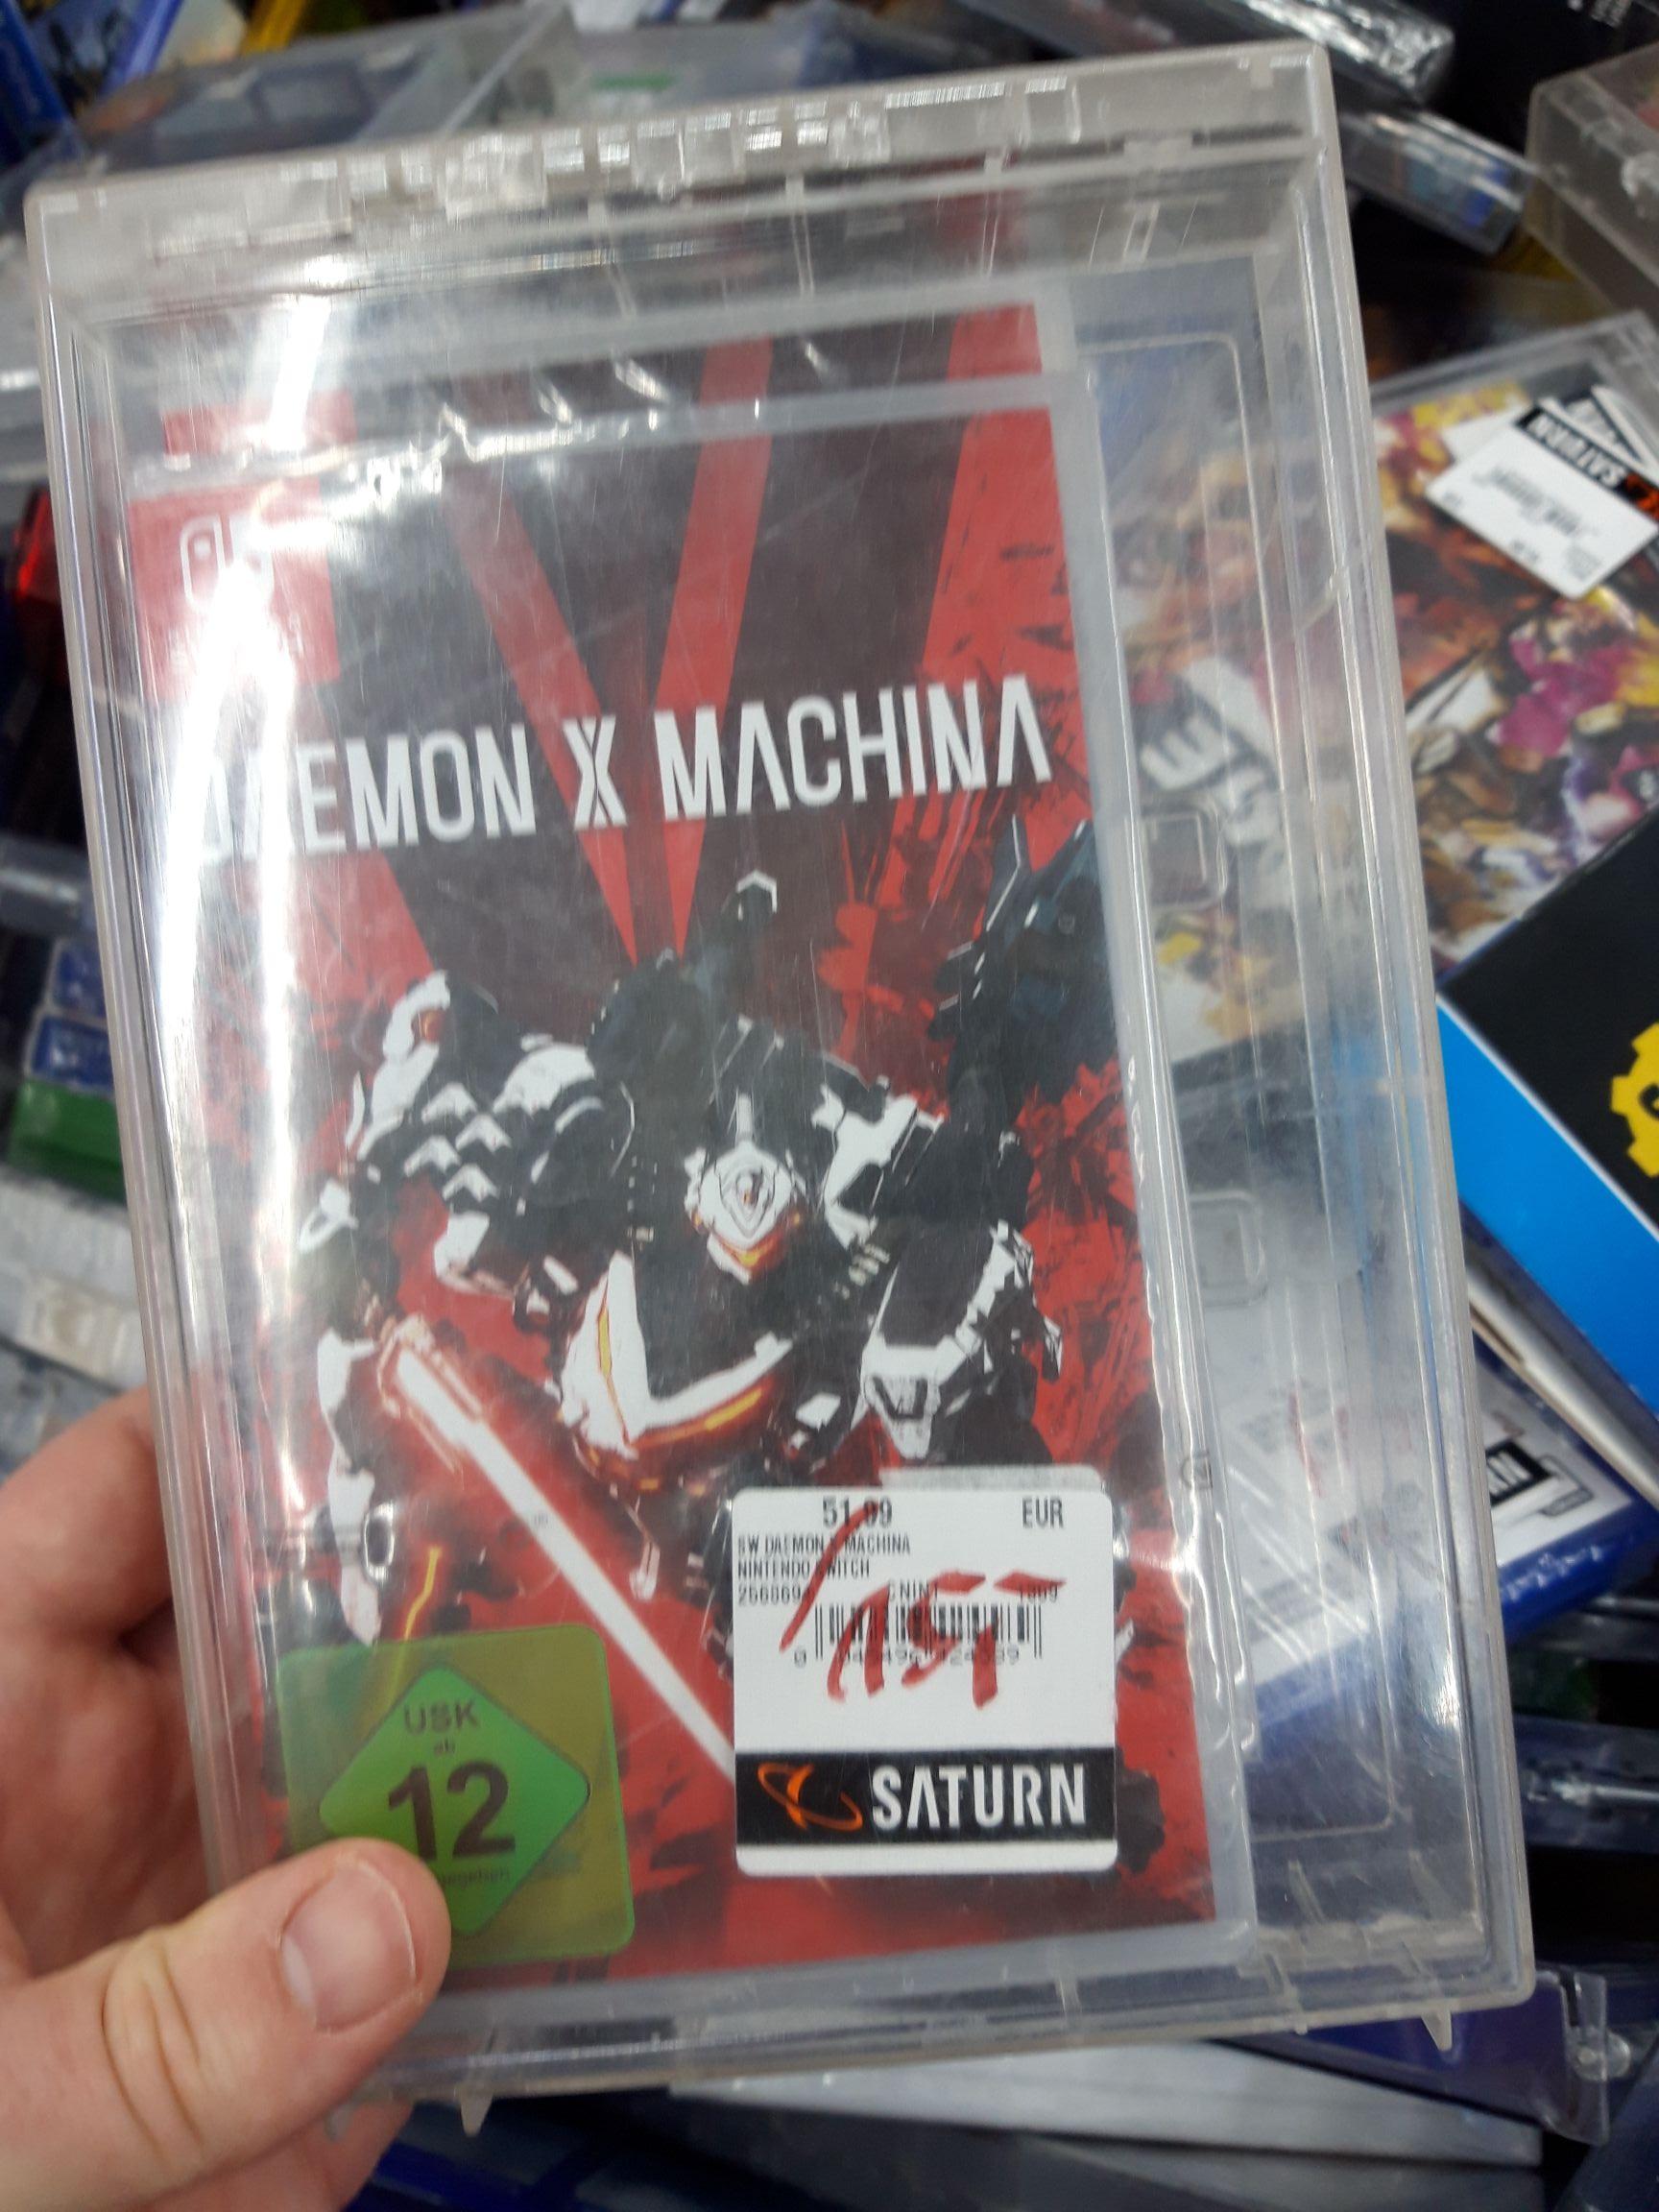 Lokal Saturn - Daemon X Machina Switch NRW Oberhausen Centro